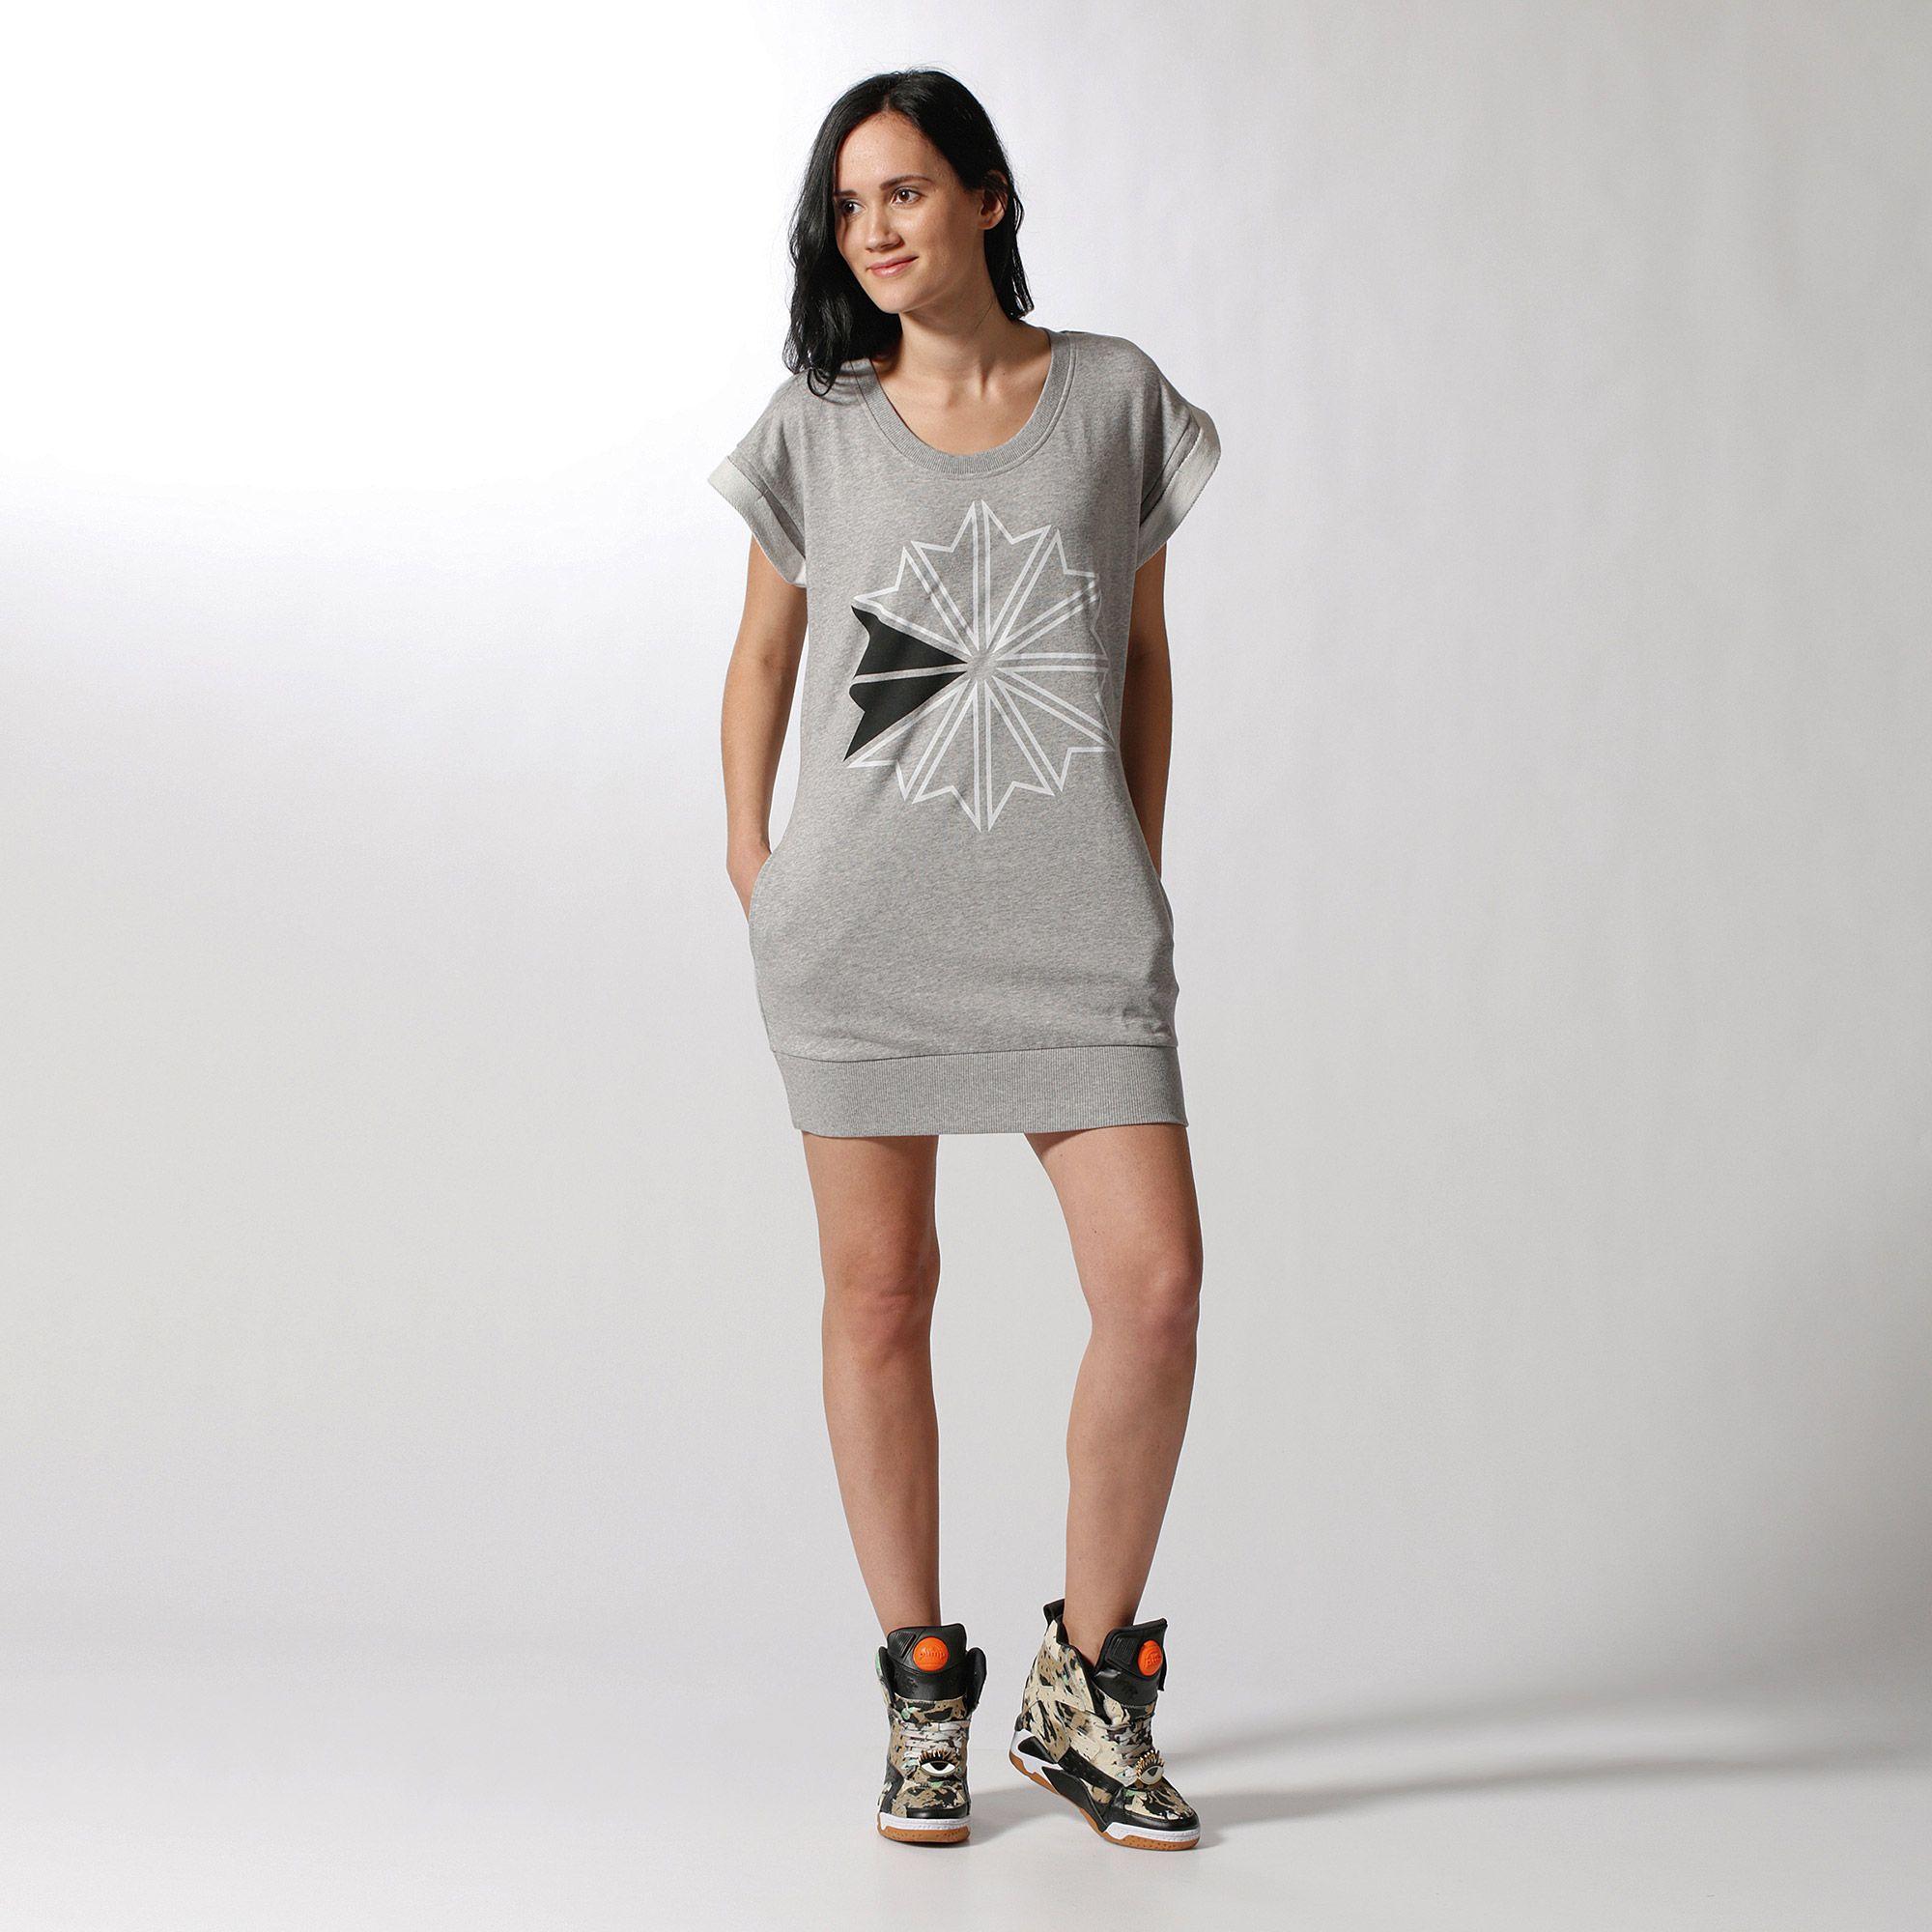 Vestido Classic Mujer FelpagrisManelsanchez Reebok pt JKF1lc